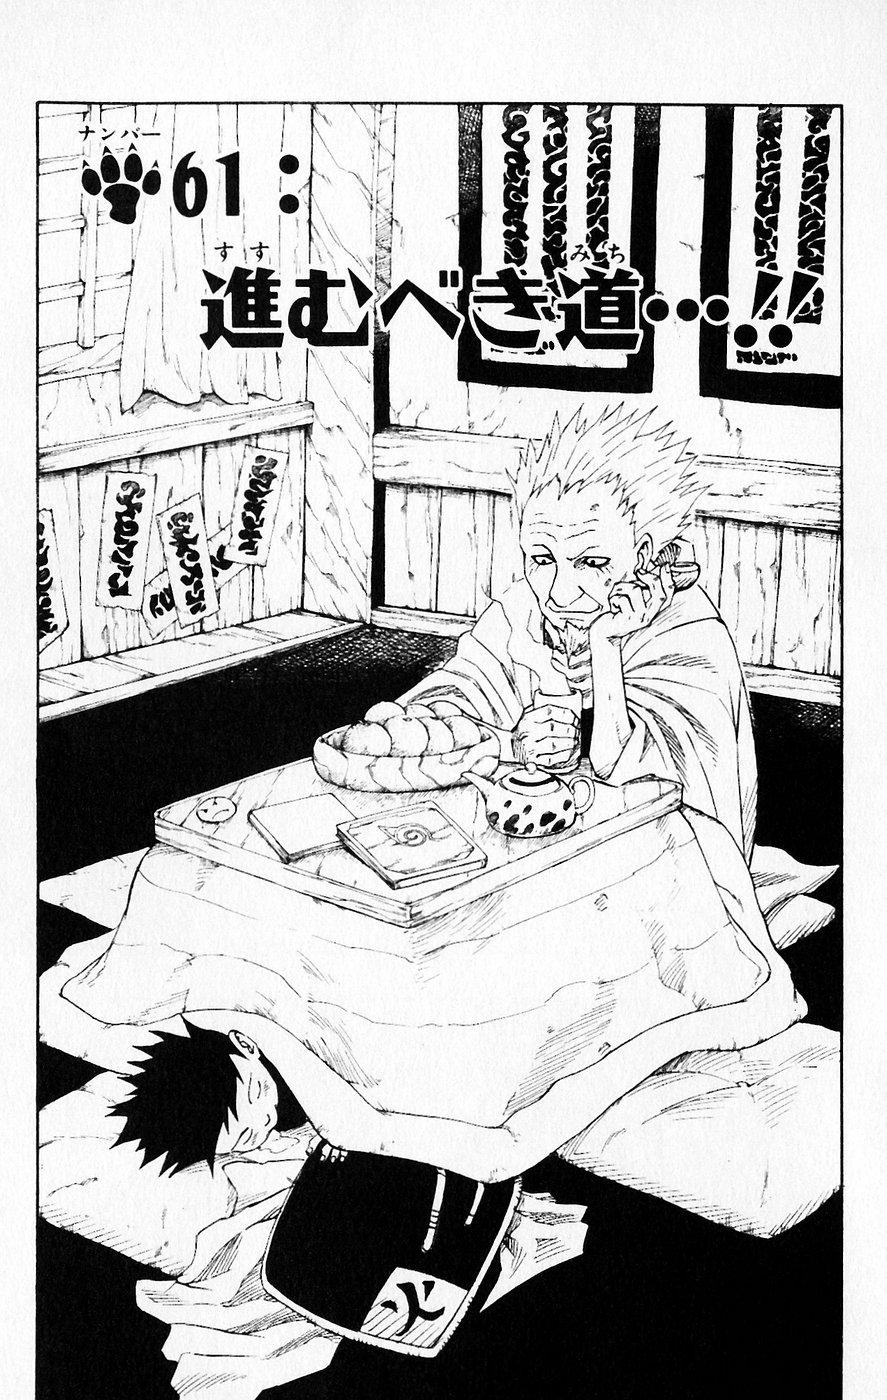 Naruto Capitolo 61